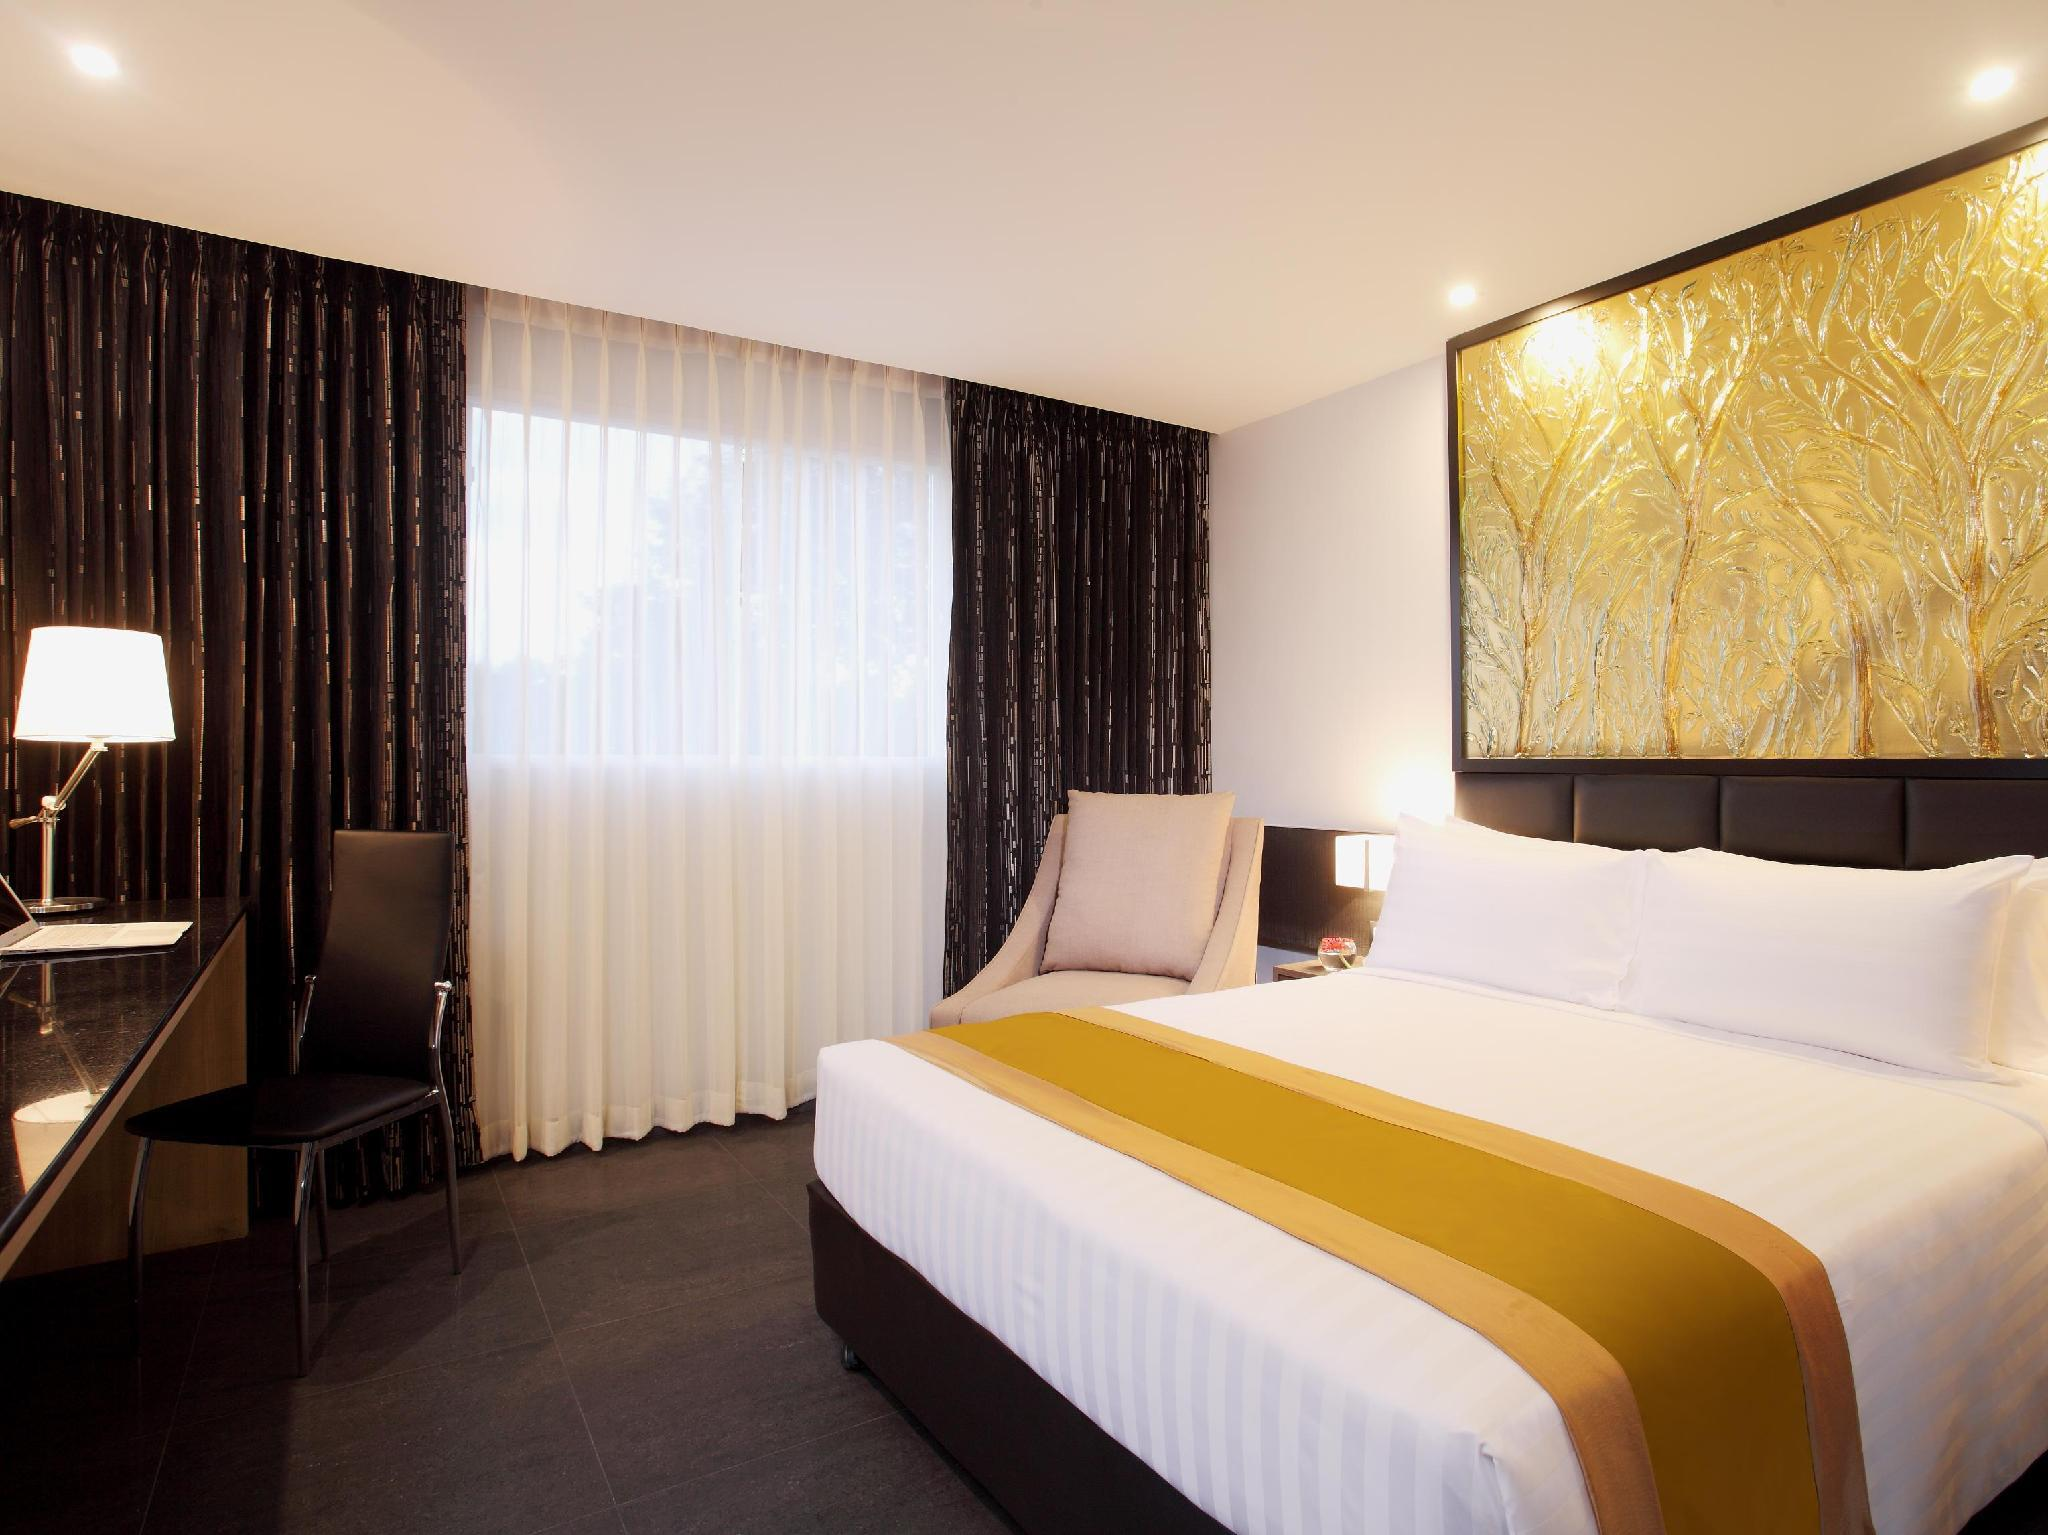 Nova Express Pattaya Hotel โรงแรมโนวา เอ็กซ์เพรส พัทยา